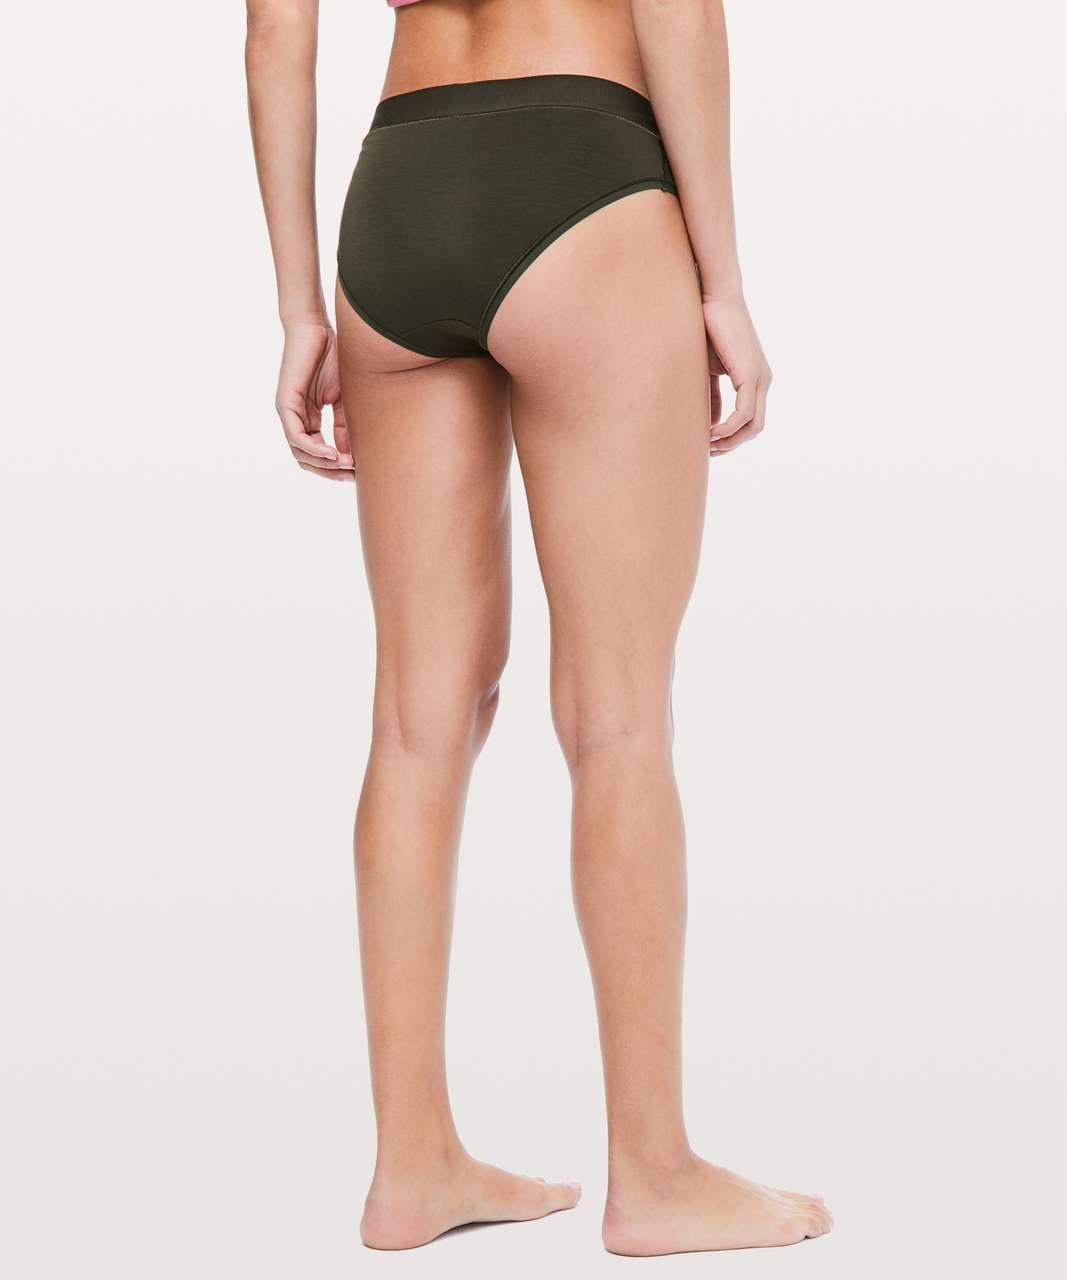 Lululemon Mula Bandhawear Bikini *3 Pack - Dark Olive / Blissful Pink / Petrol Blue